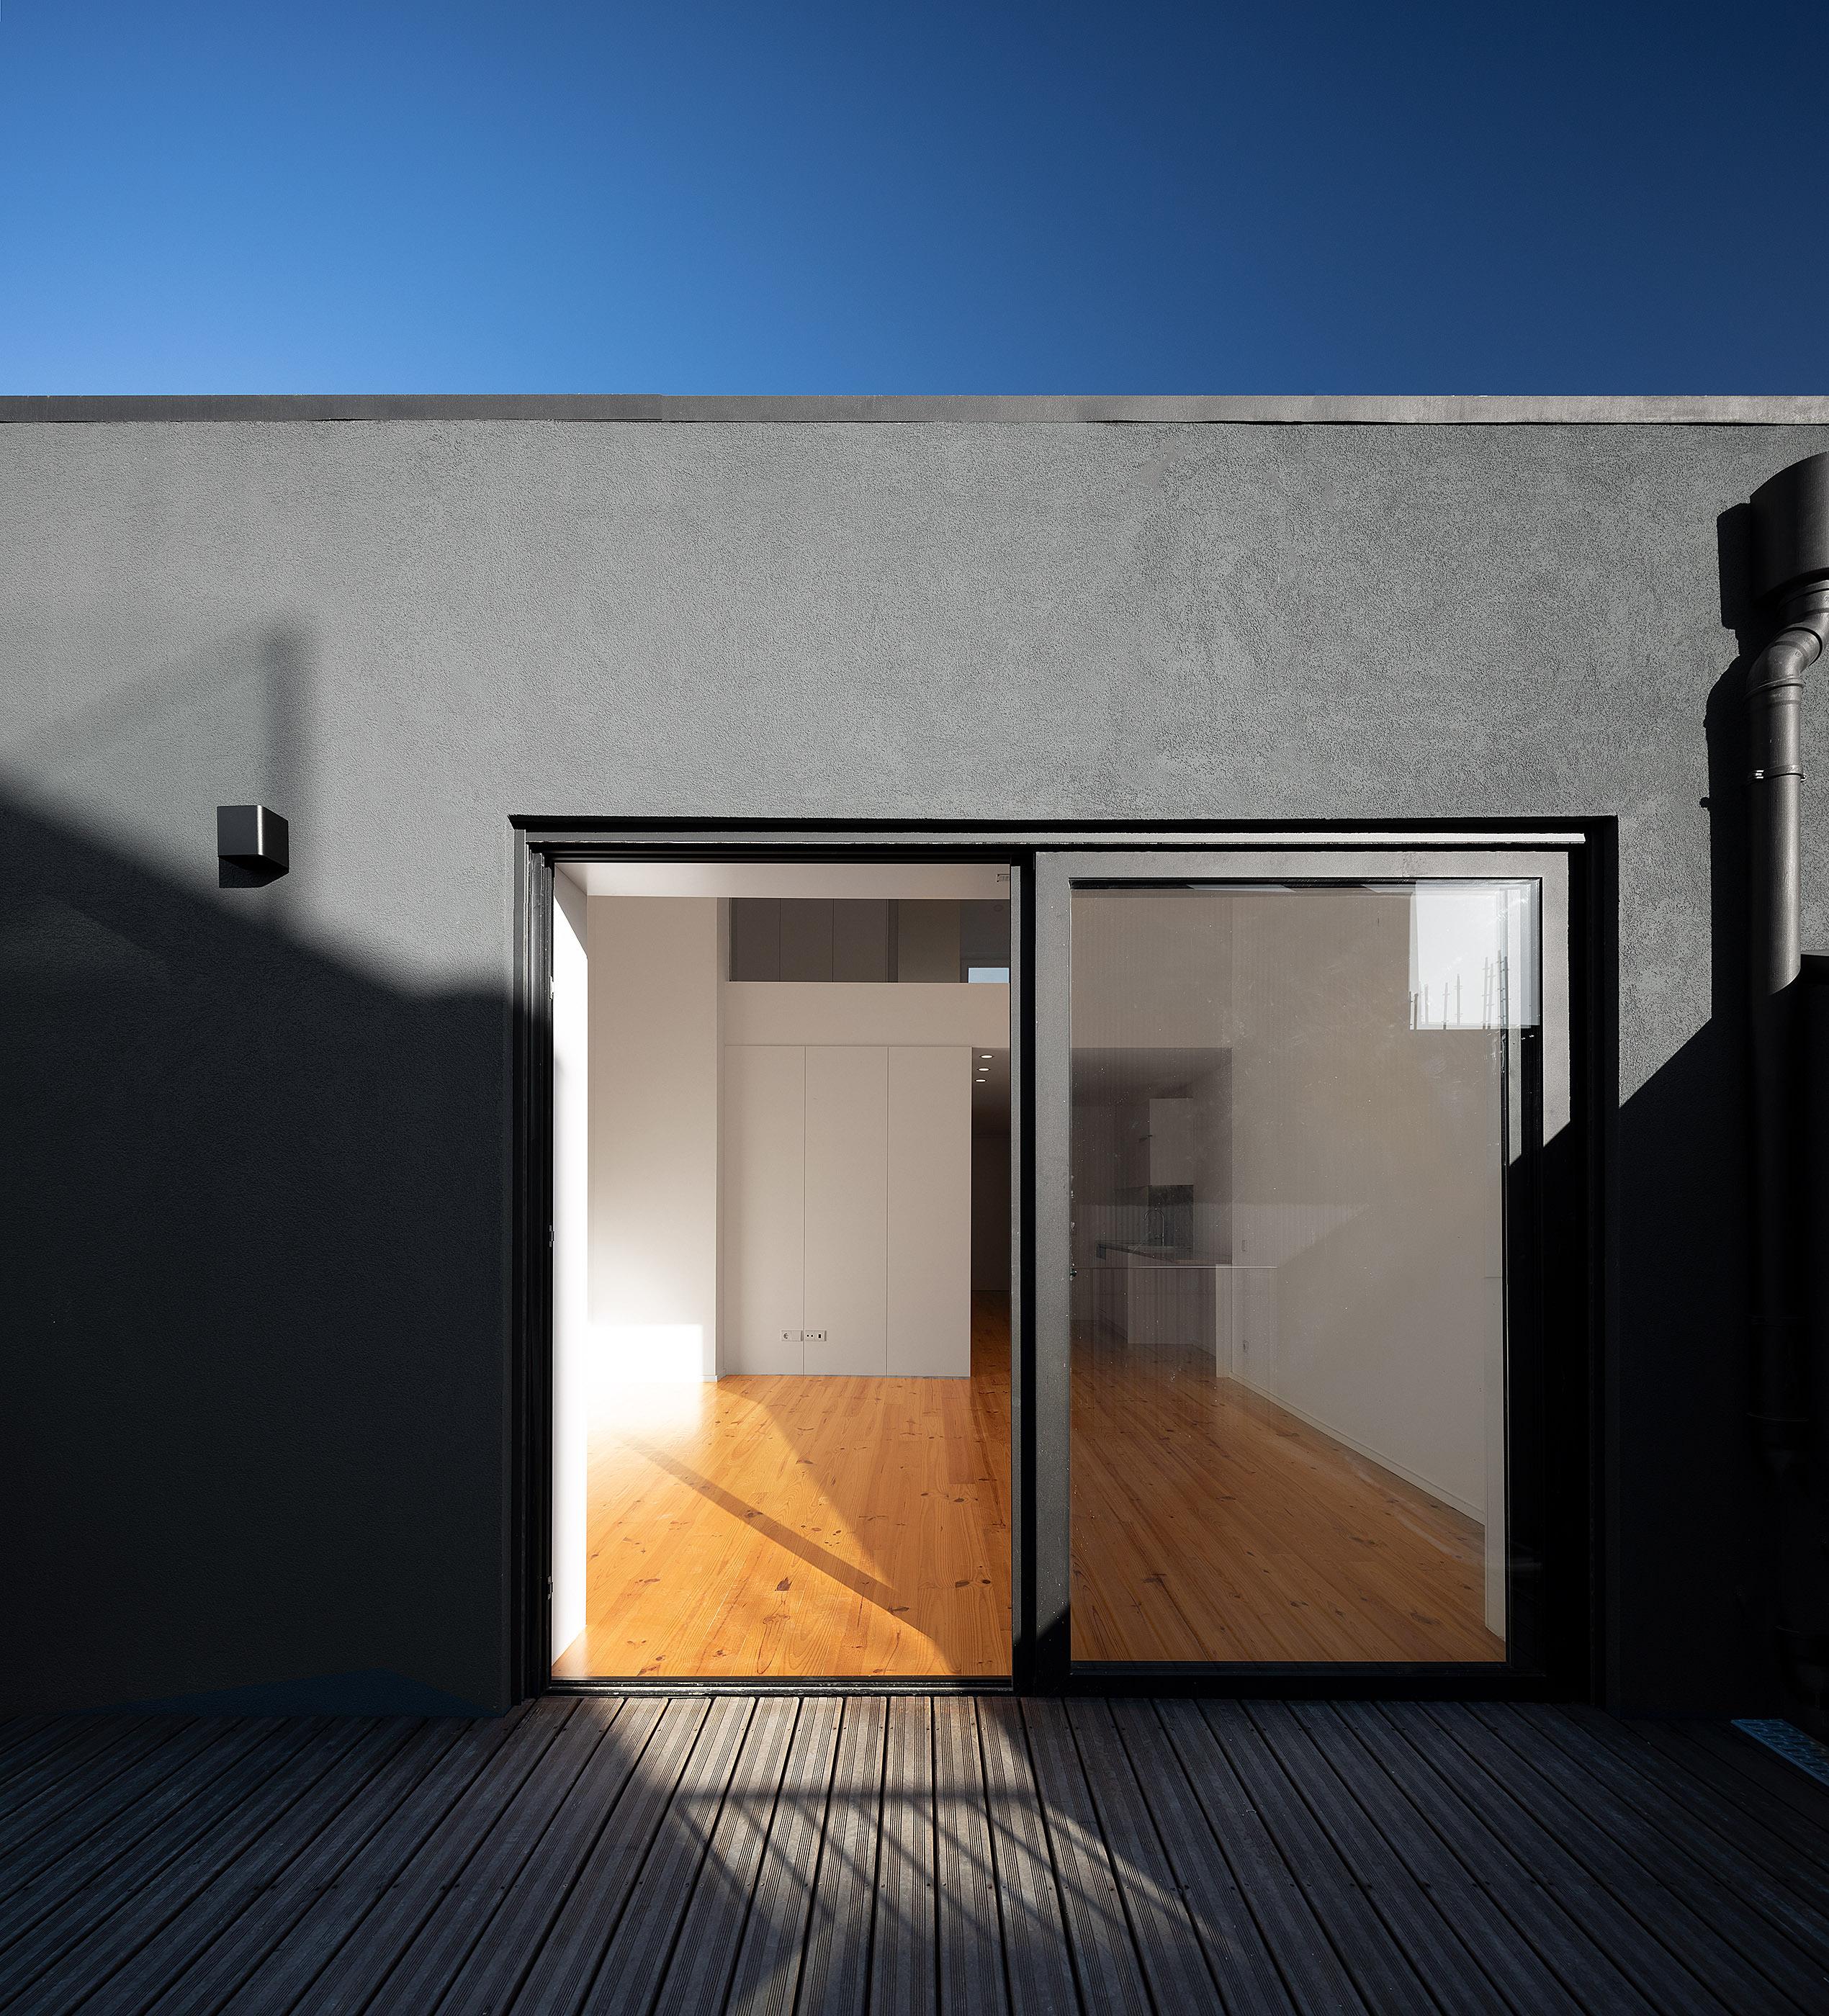 20190315 Mimool Rua Da Alegria 63 do fotografo Ivo Tavares Studio